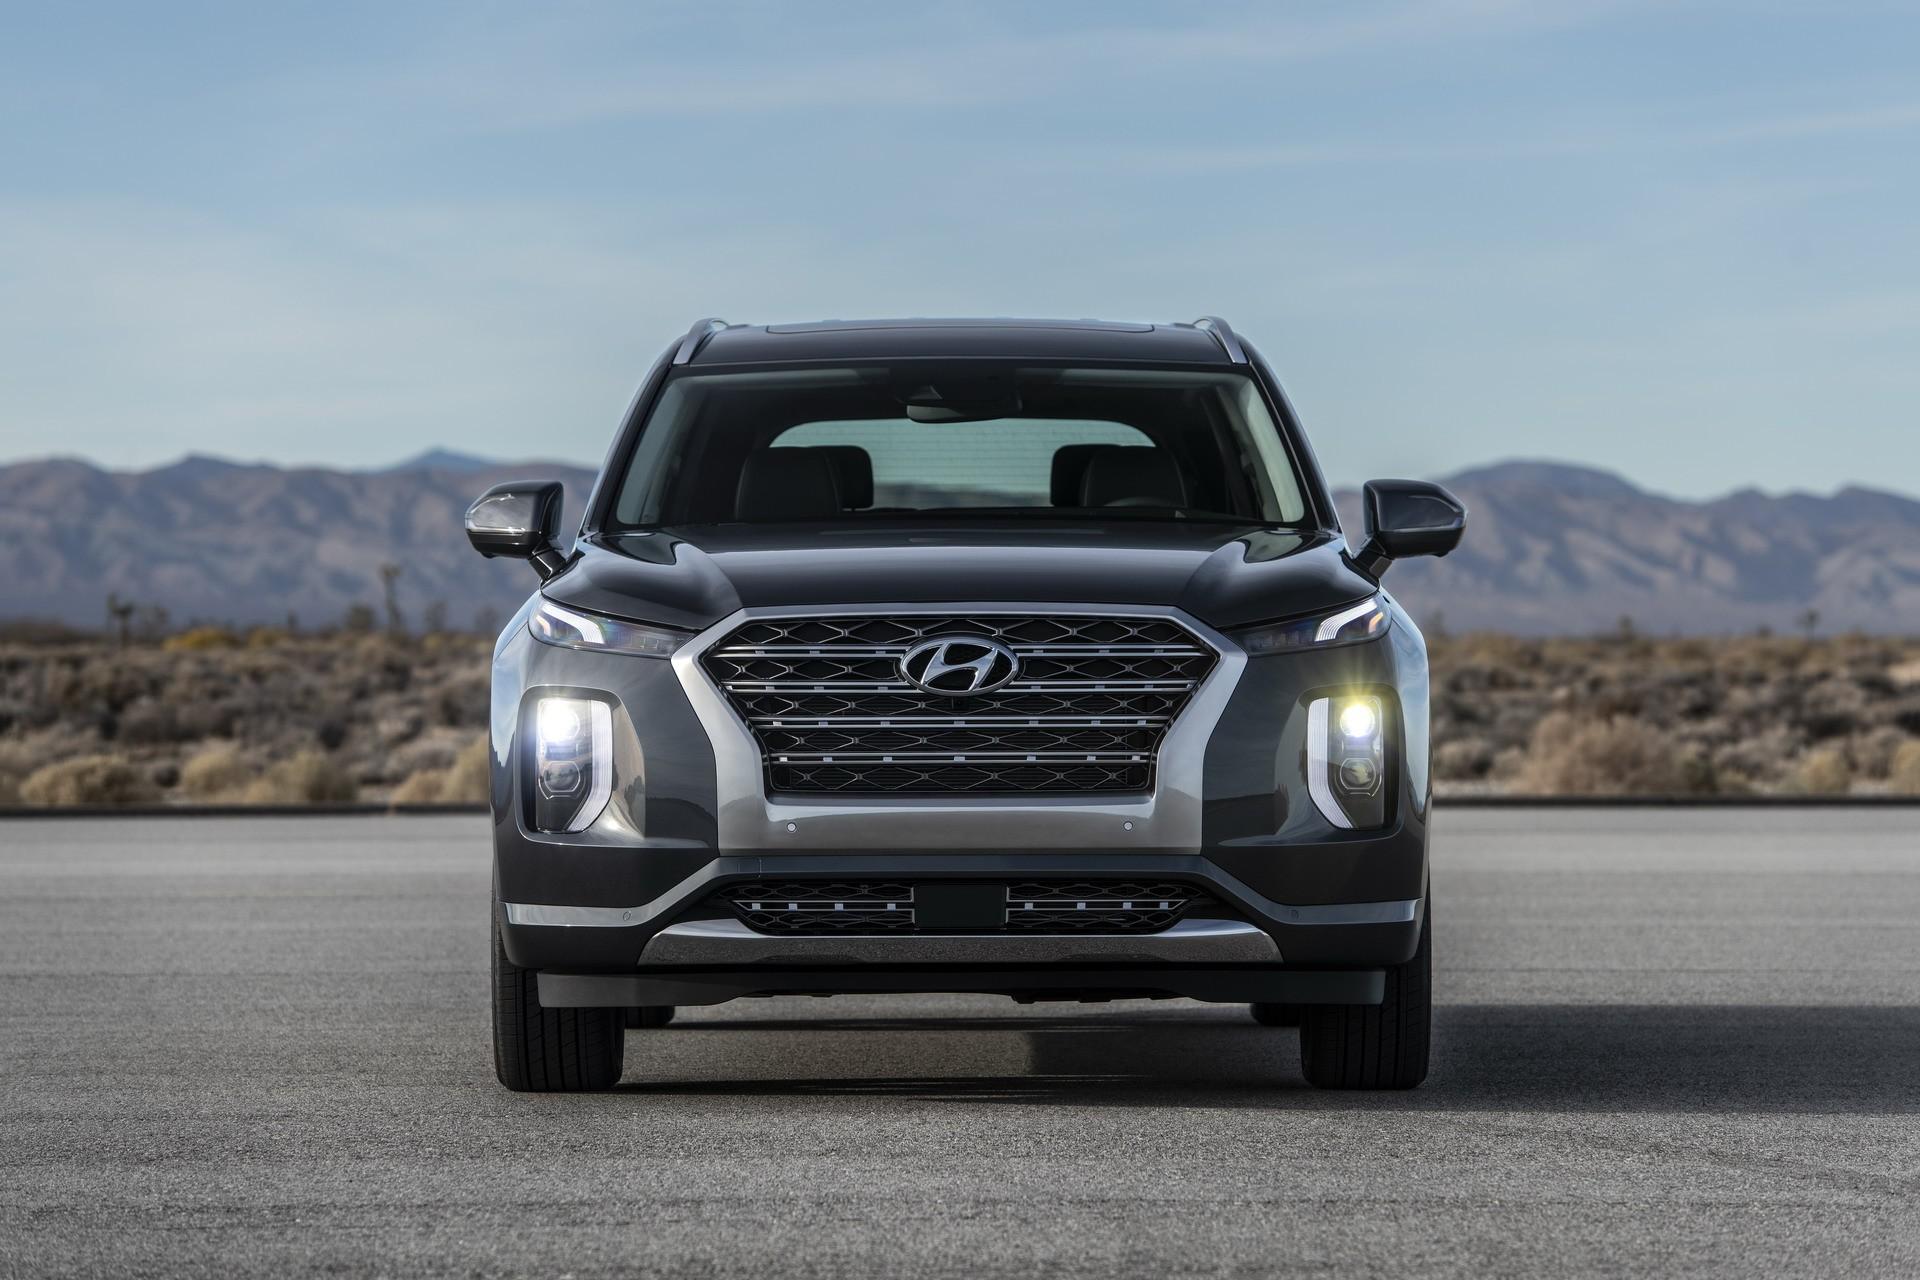 2020 Hyundai Palisade Oozes 8 Seat Crossover Luxury